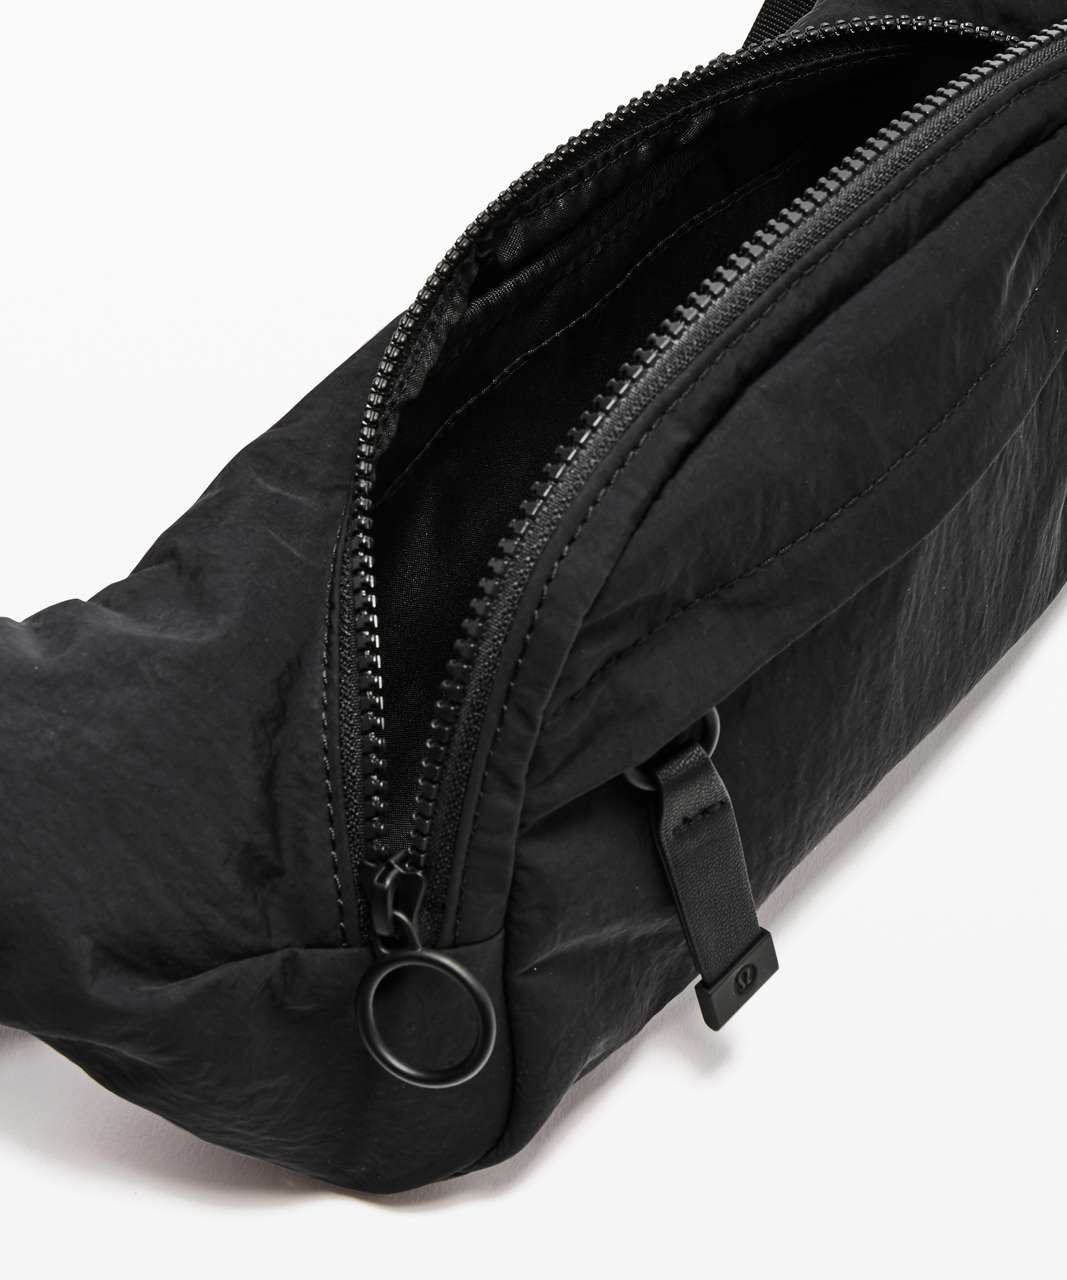 47064bd8bc Lululemon On The Beat Belt Bag *4.5L - Black - lulu fanatics